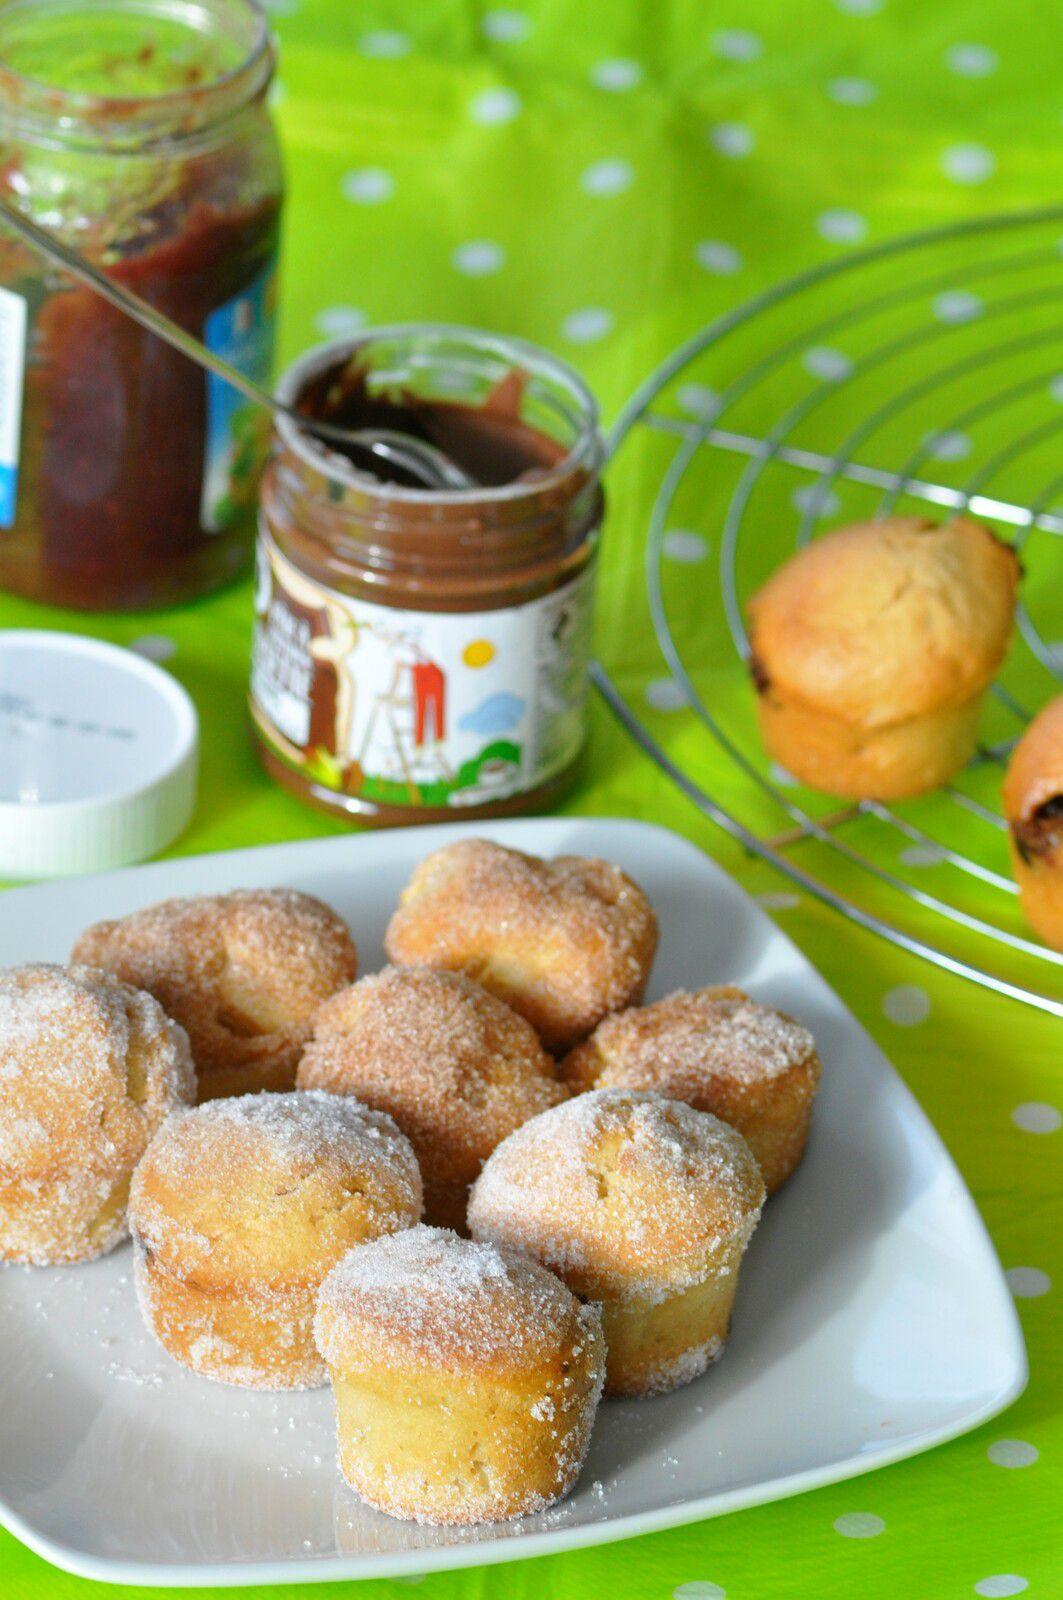 Doffins, duffins les petits muffins qui font semblant d'être des donuts....